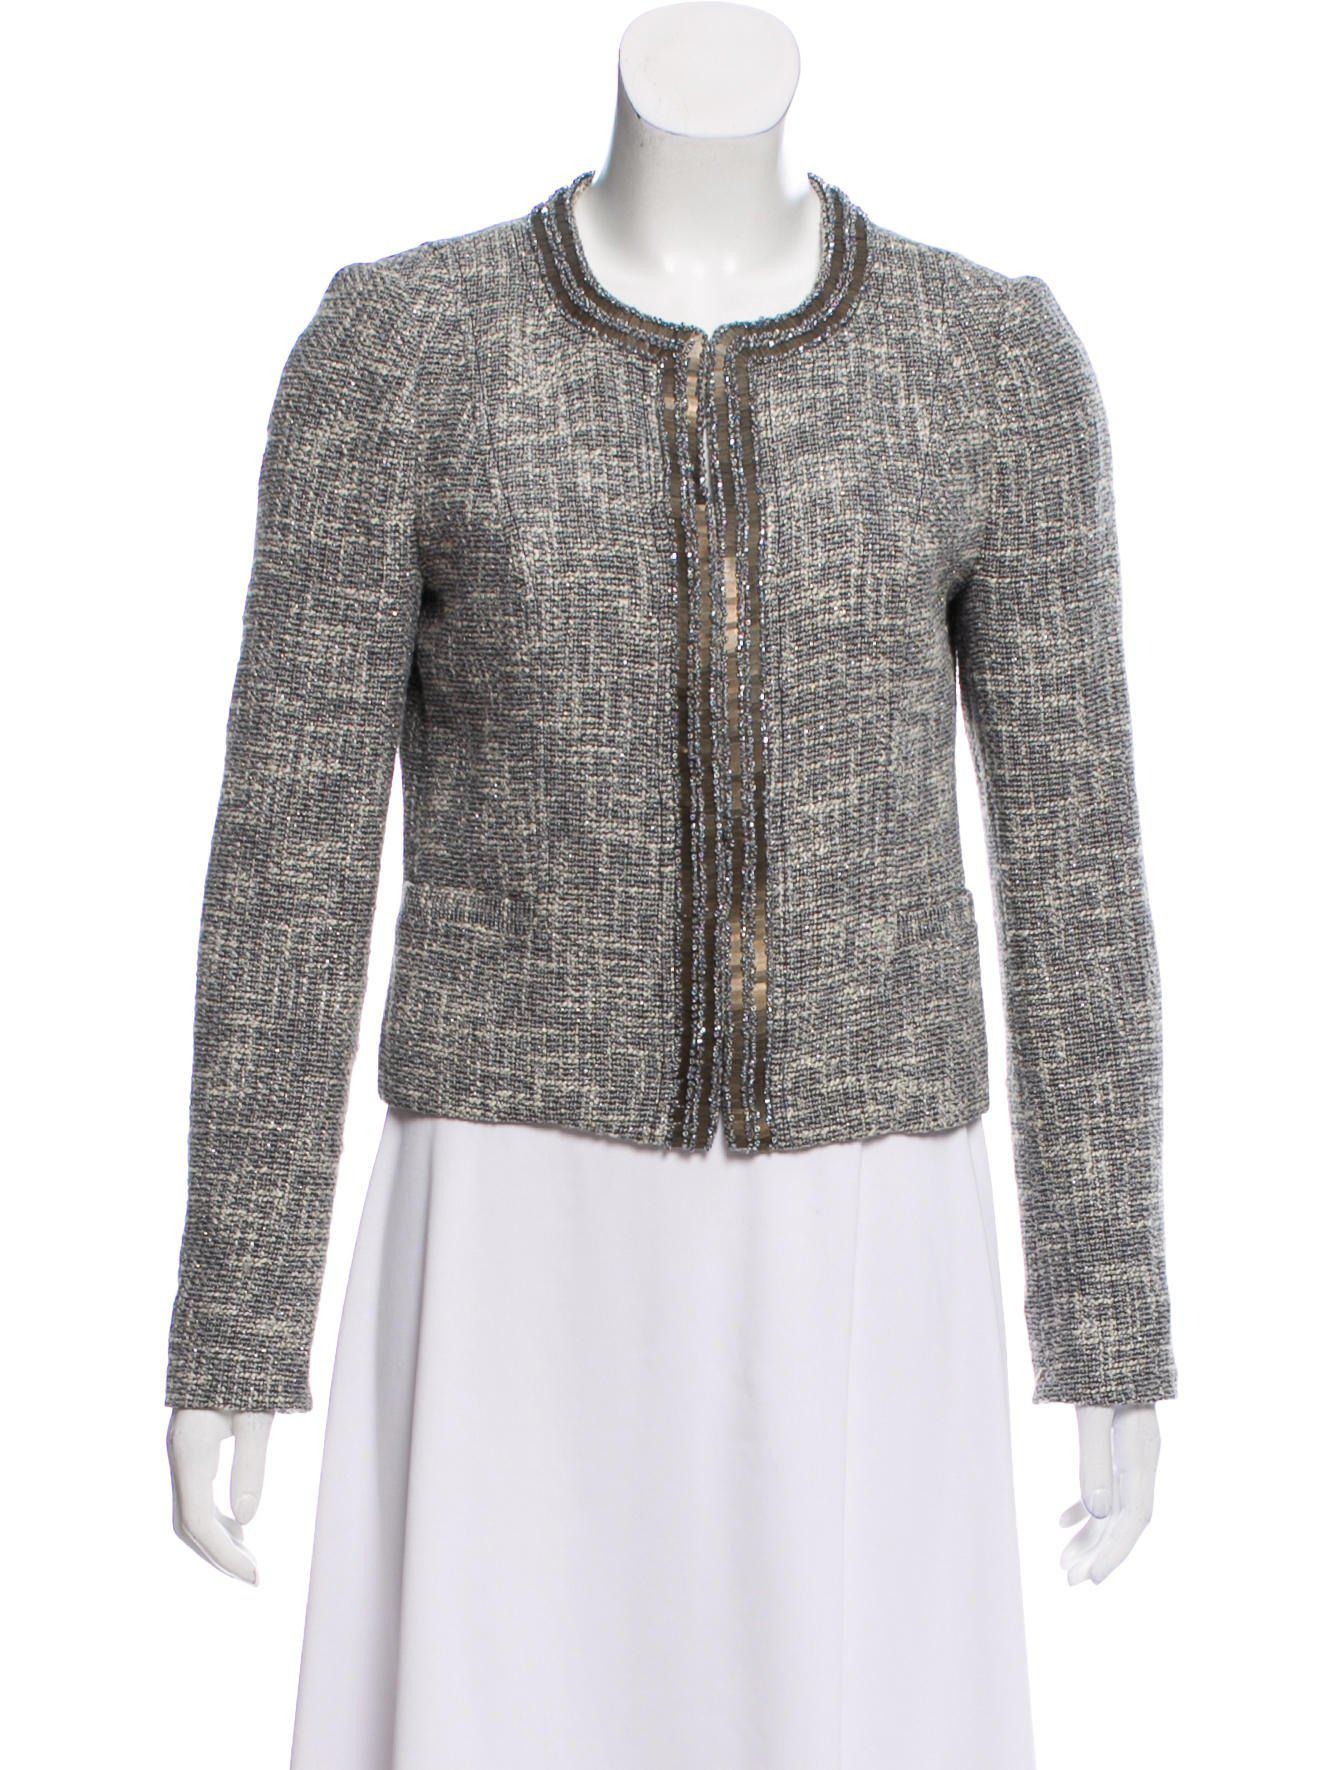 b408e87da292 Lyst - Tory Burch Tweed Structured Blazer Grey in Gray